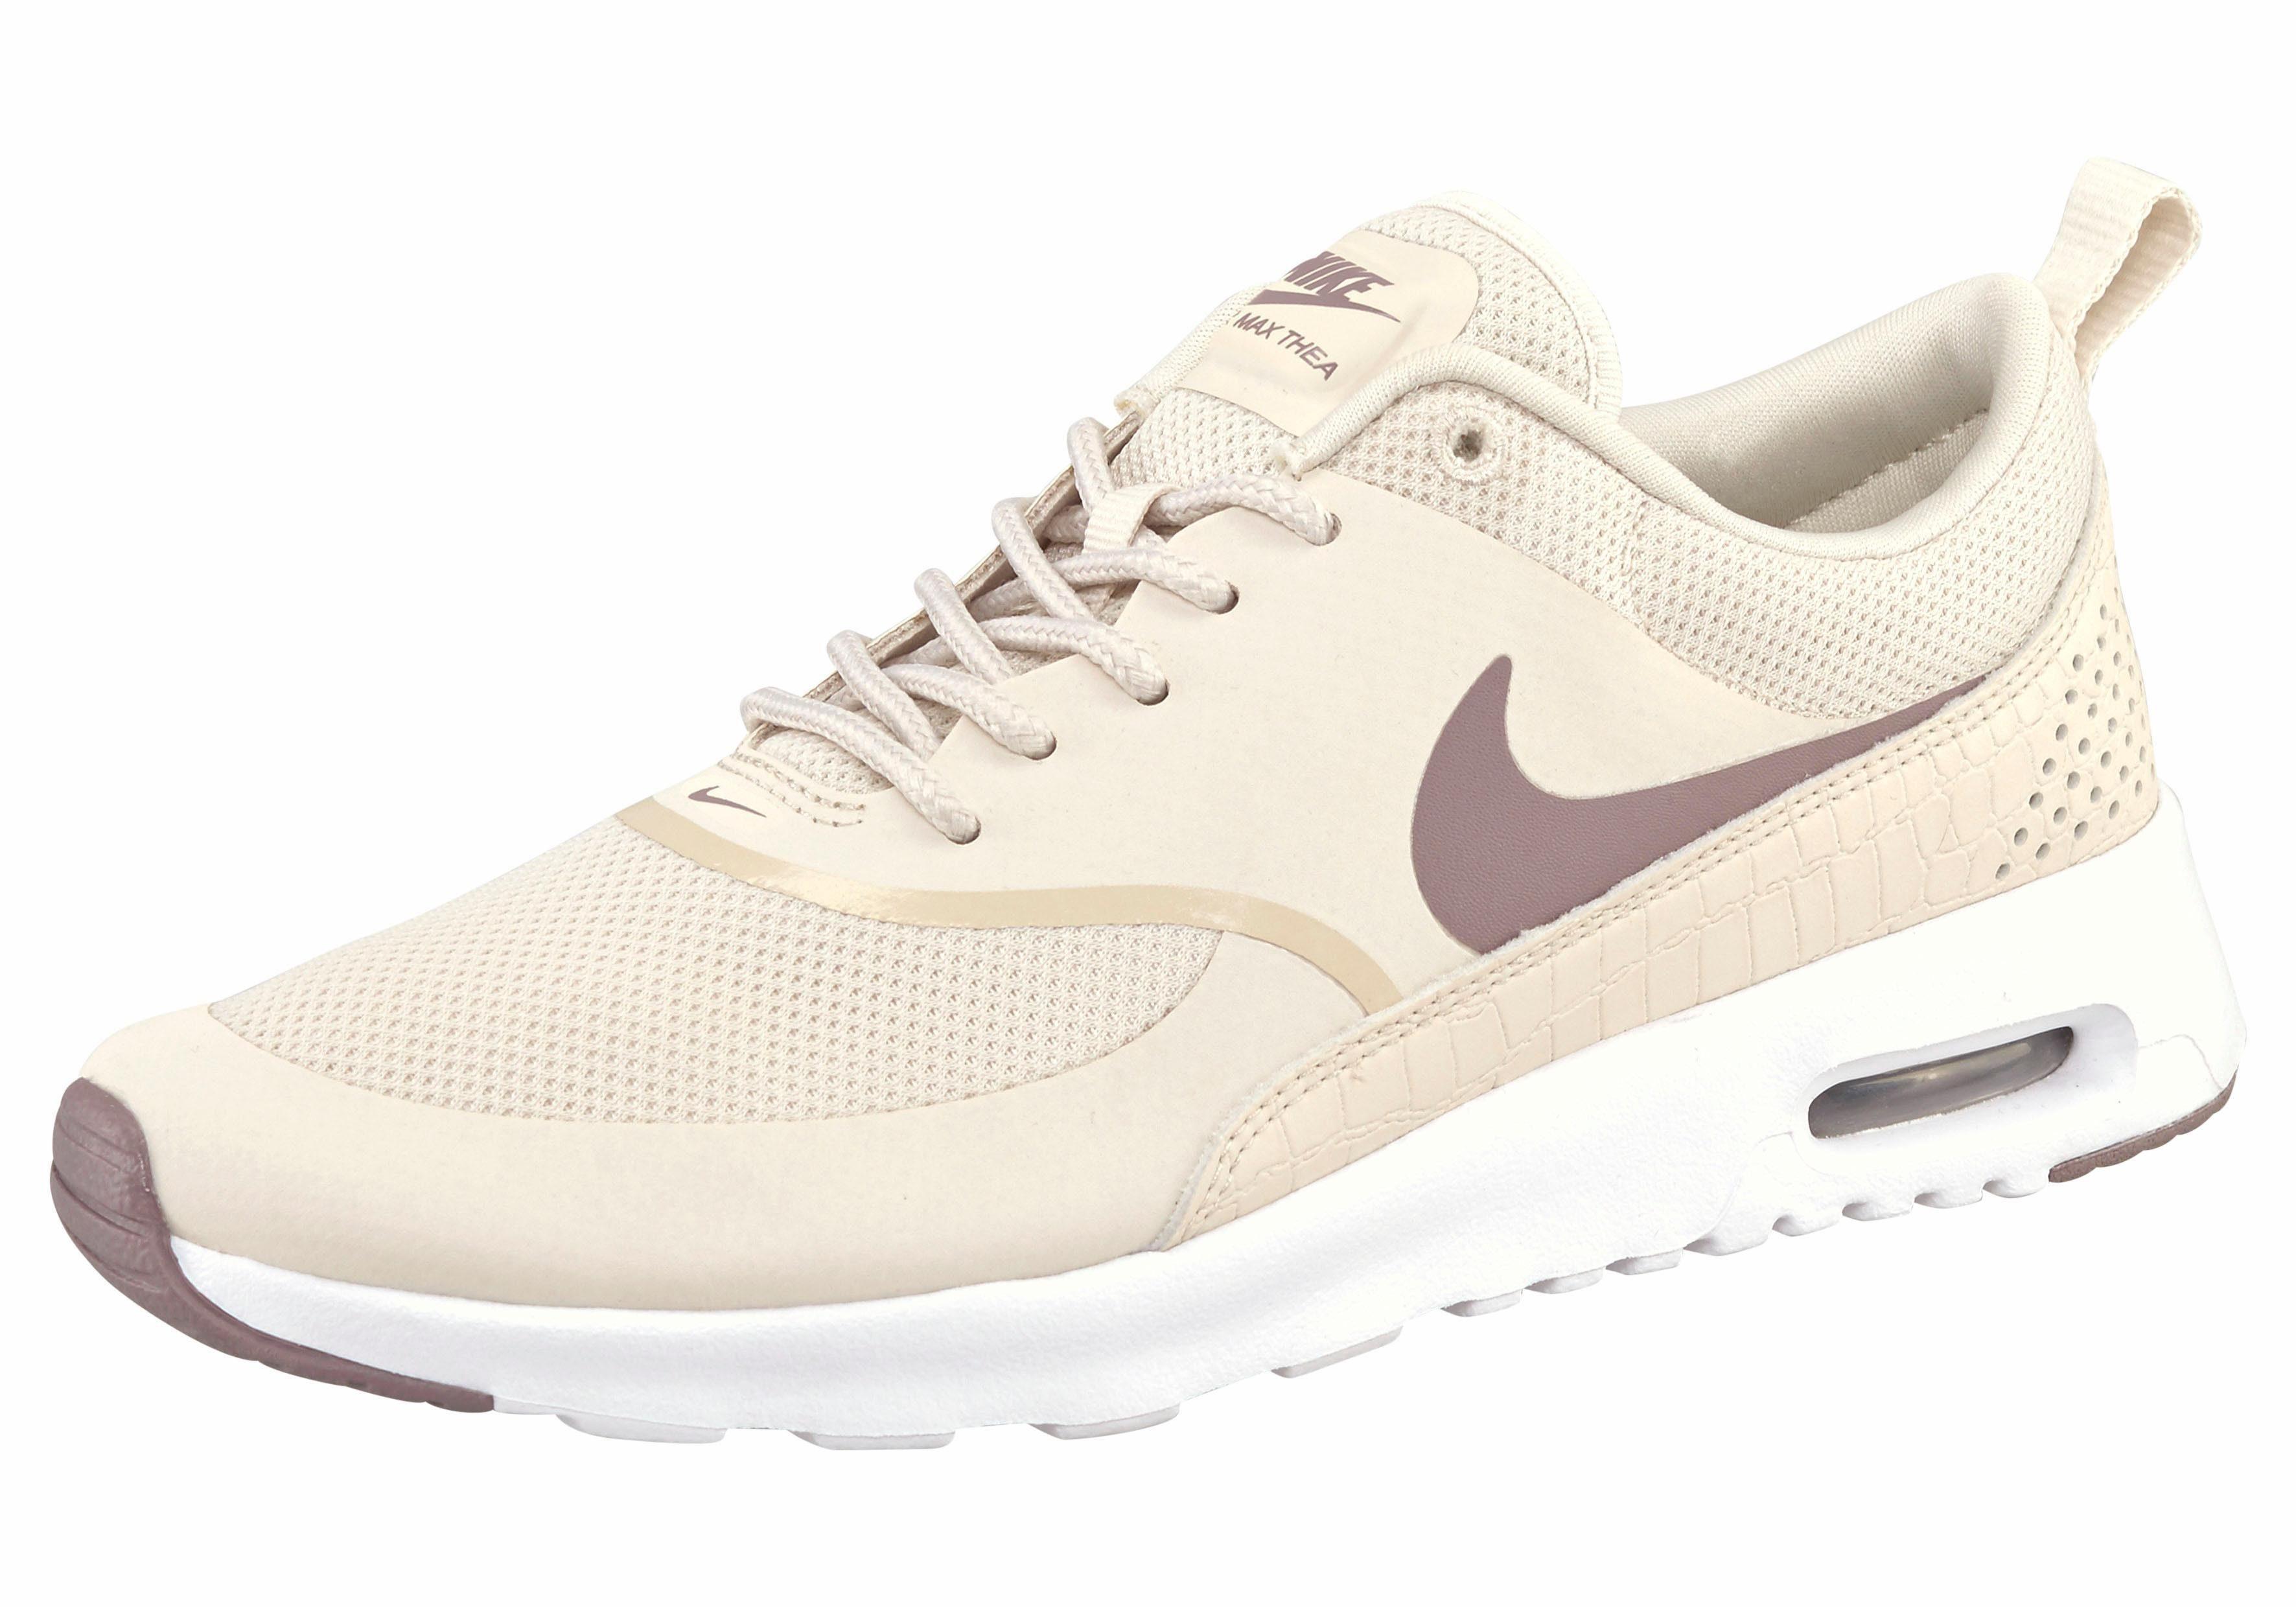 Nike Sportswear »Wmns Air Max Thea« Sneaker, Leichte Gummilaufsohle online kaufen   OTTO